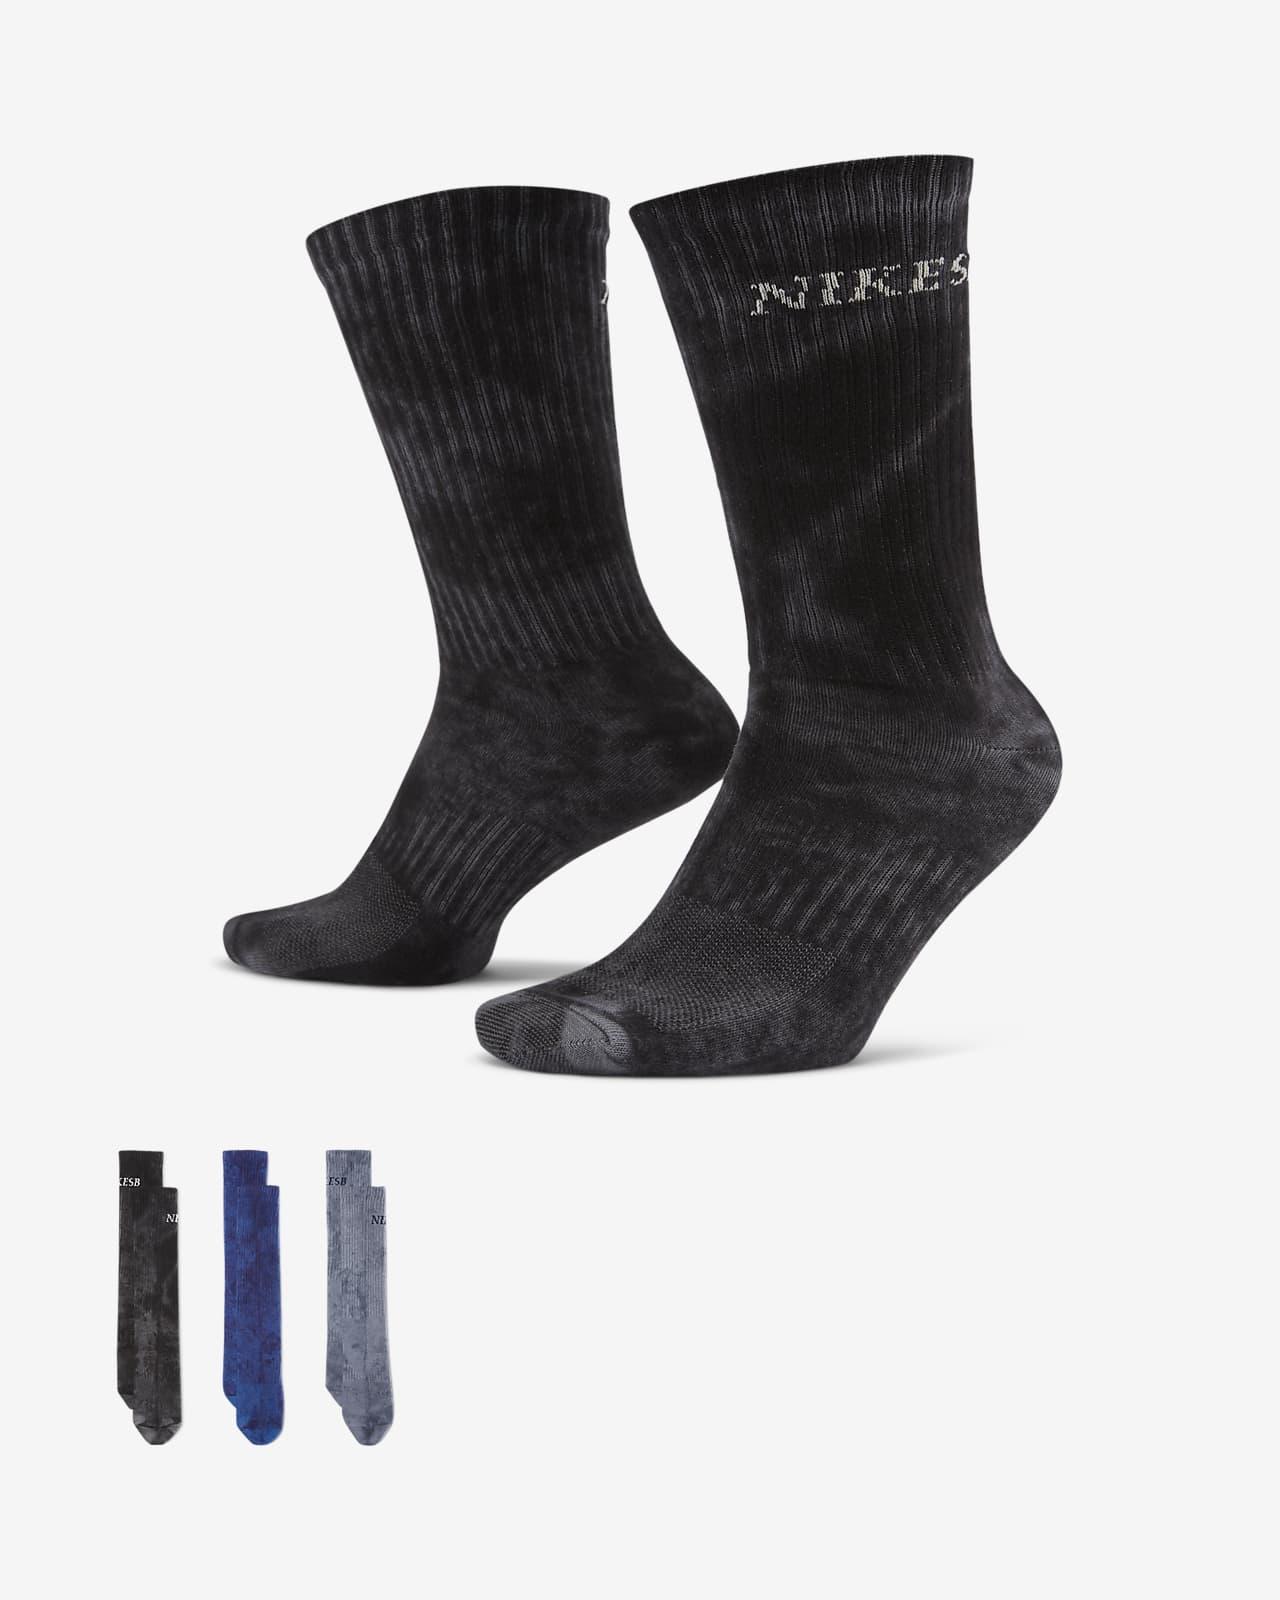 Calcetines deportivos de skateboarding Nike SB Everyday Plus Lightweight (3 pares)